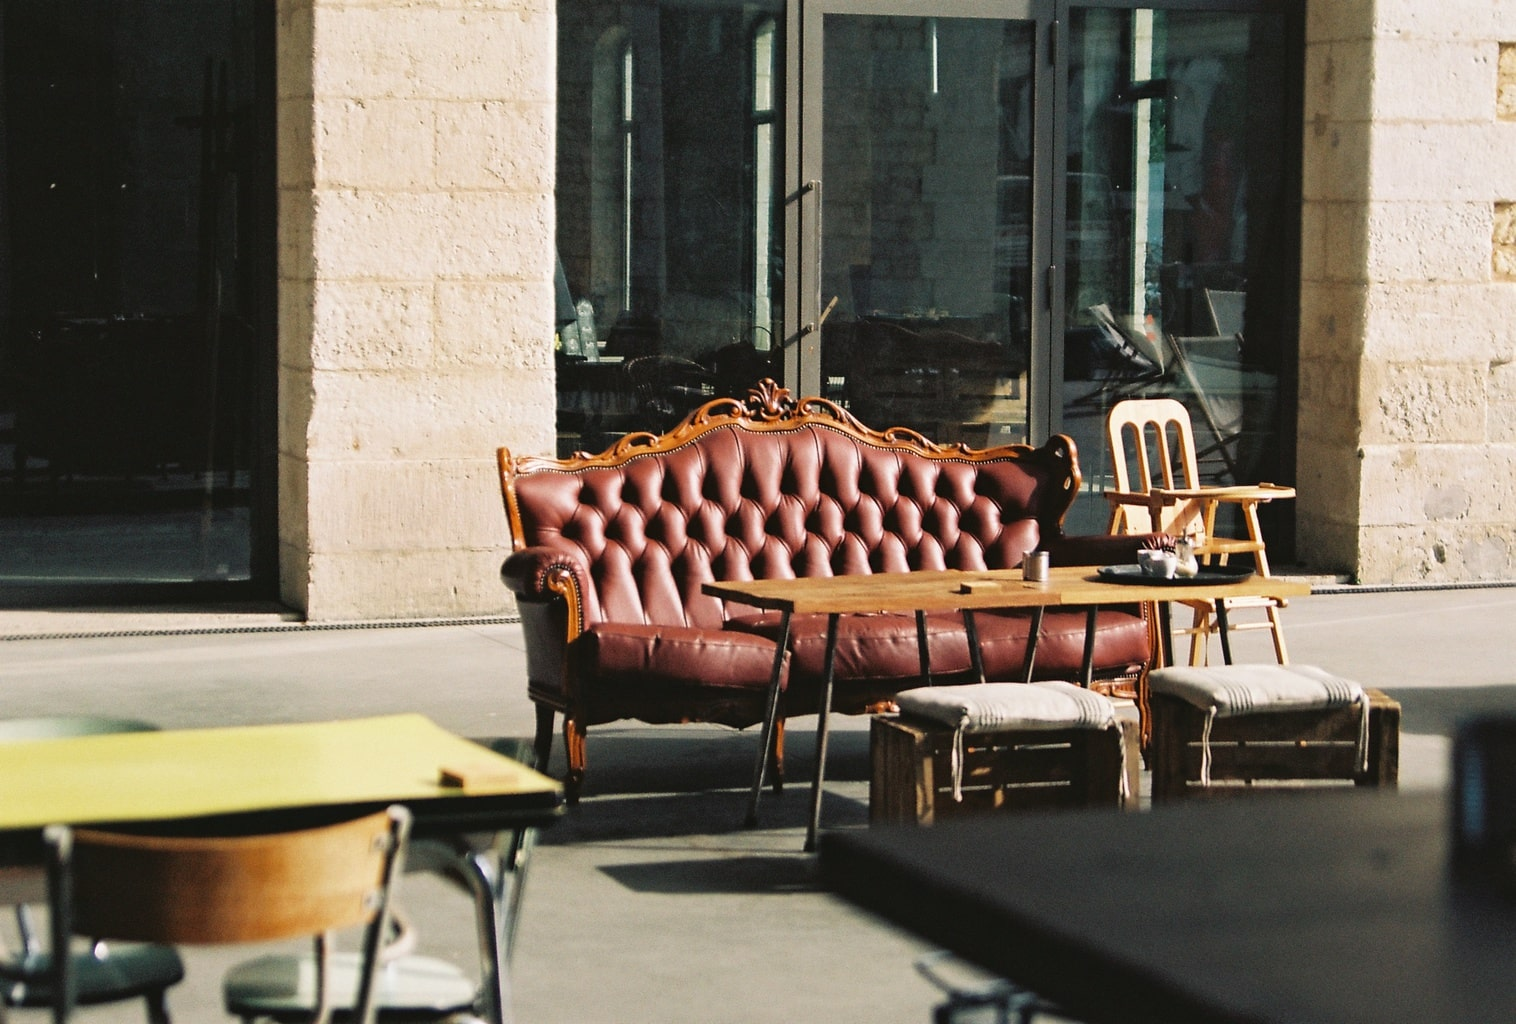 Yard sale furniture